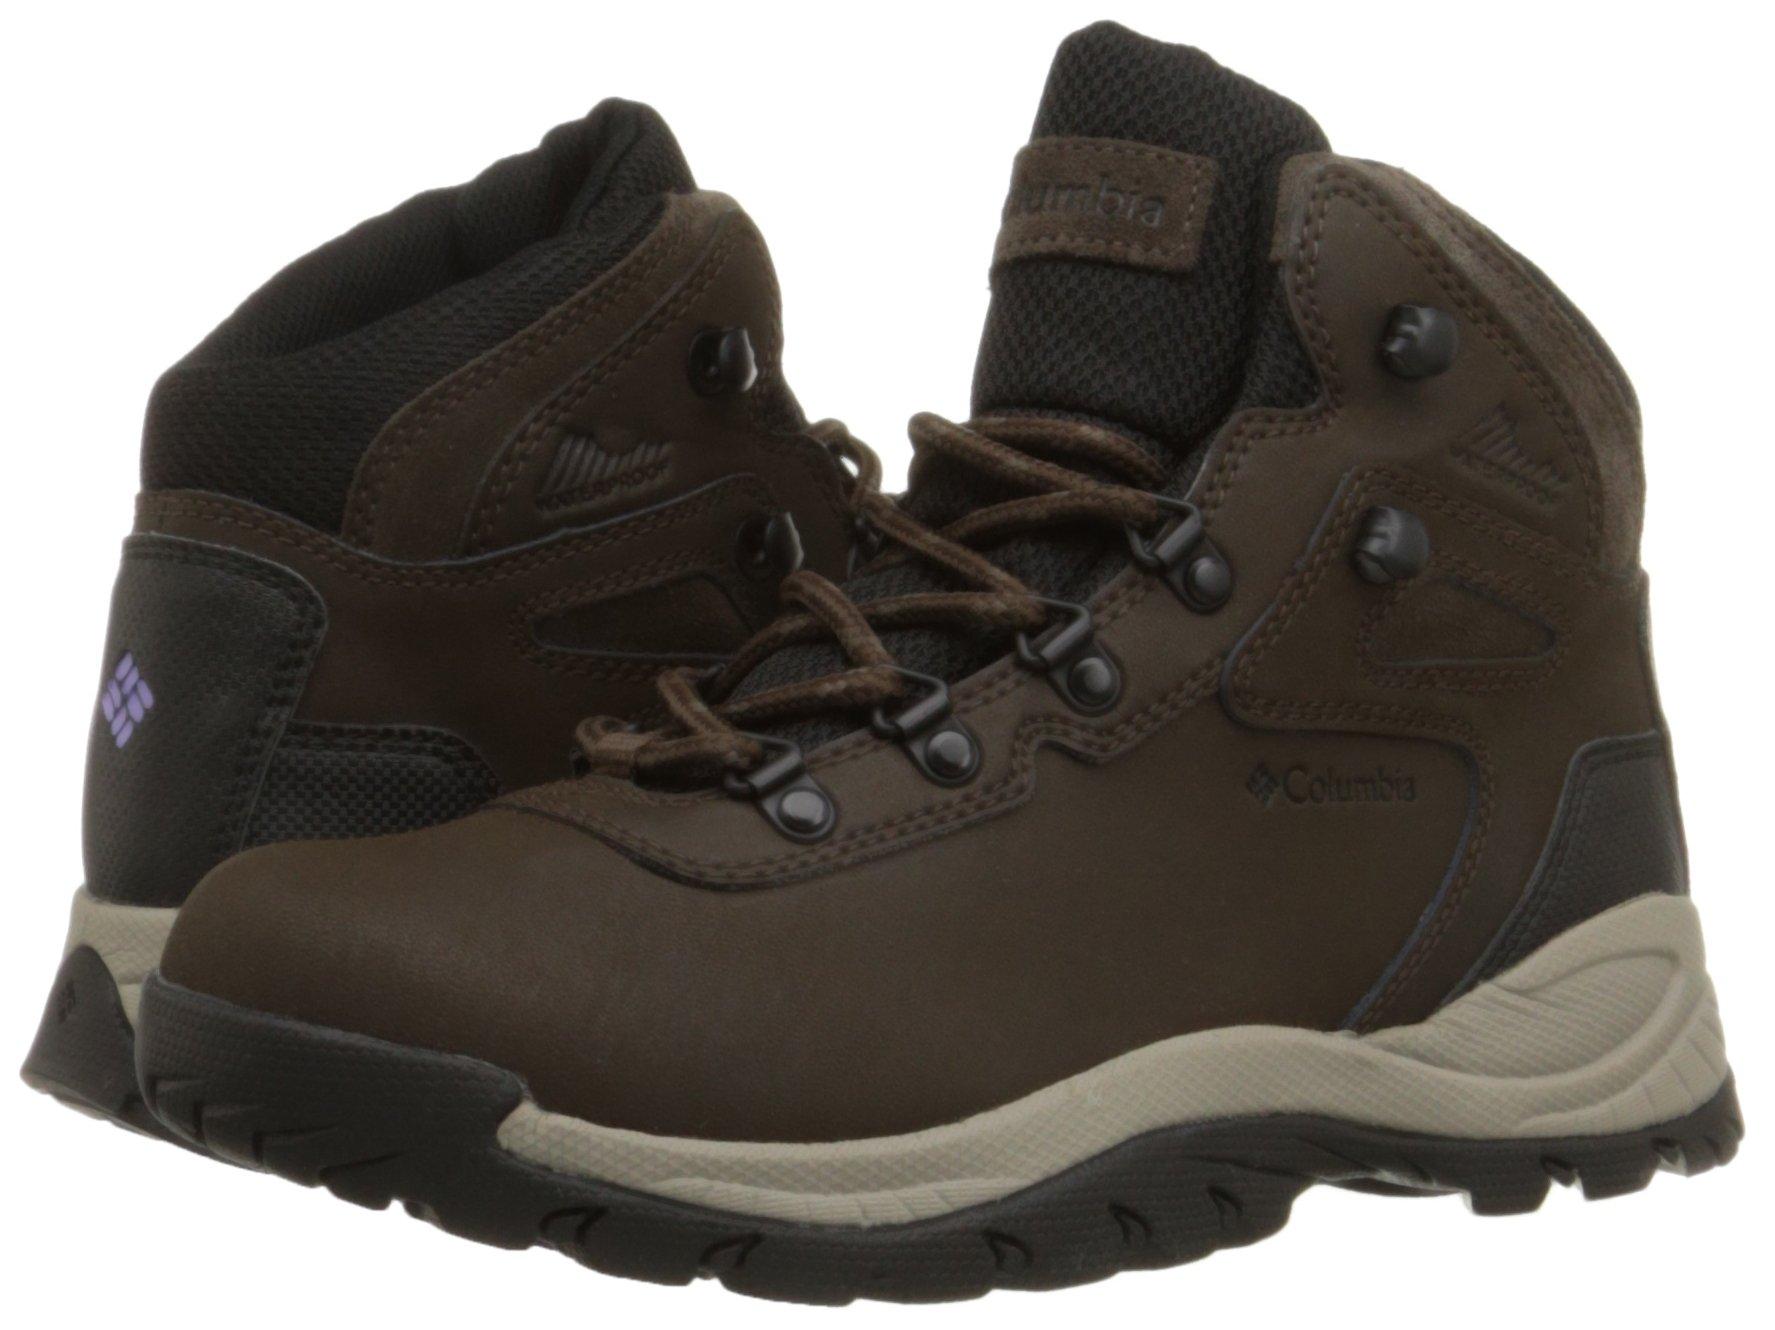 Columbia Women's Newton Ridge Plus Hiking Boot, Cordovan/Crown Jewel, 6 Regular US by Columbia (Image #6)